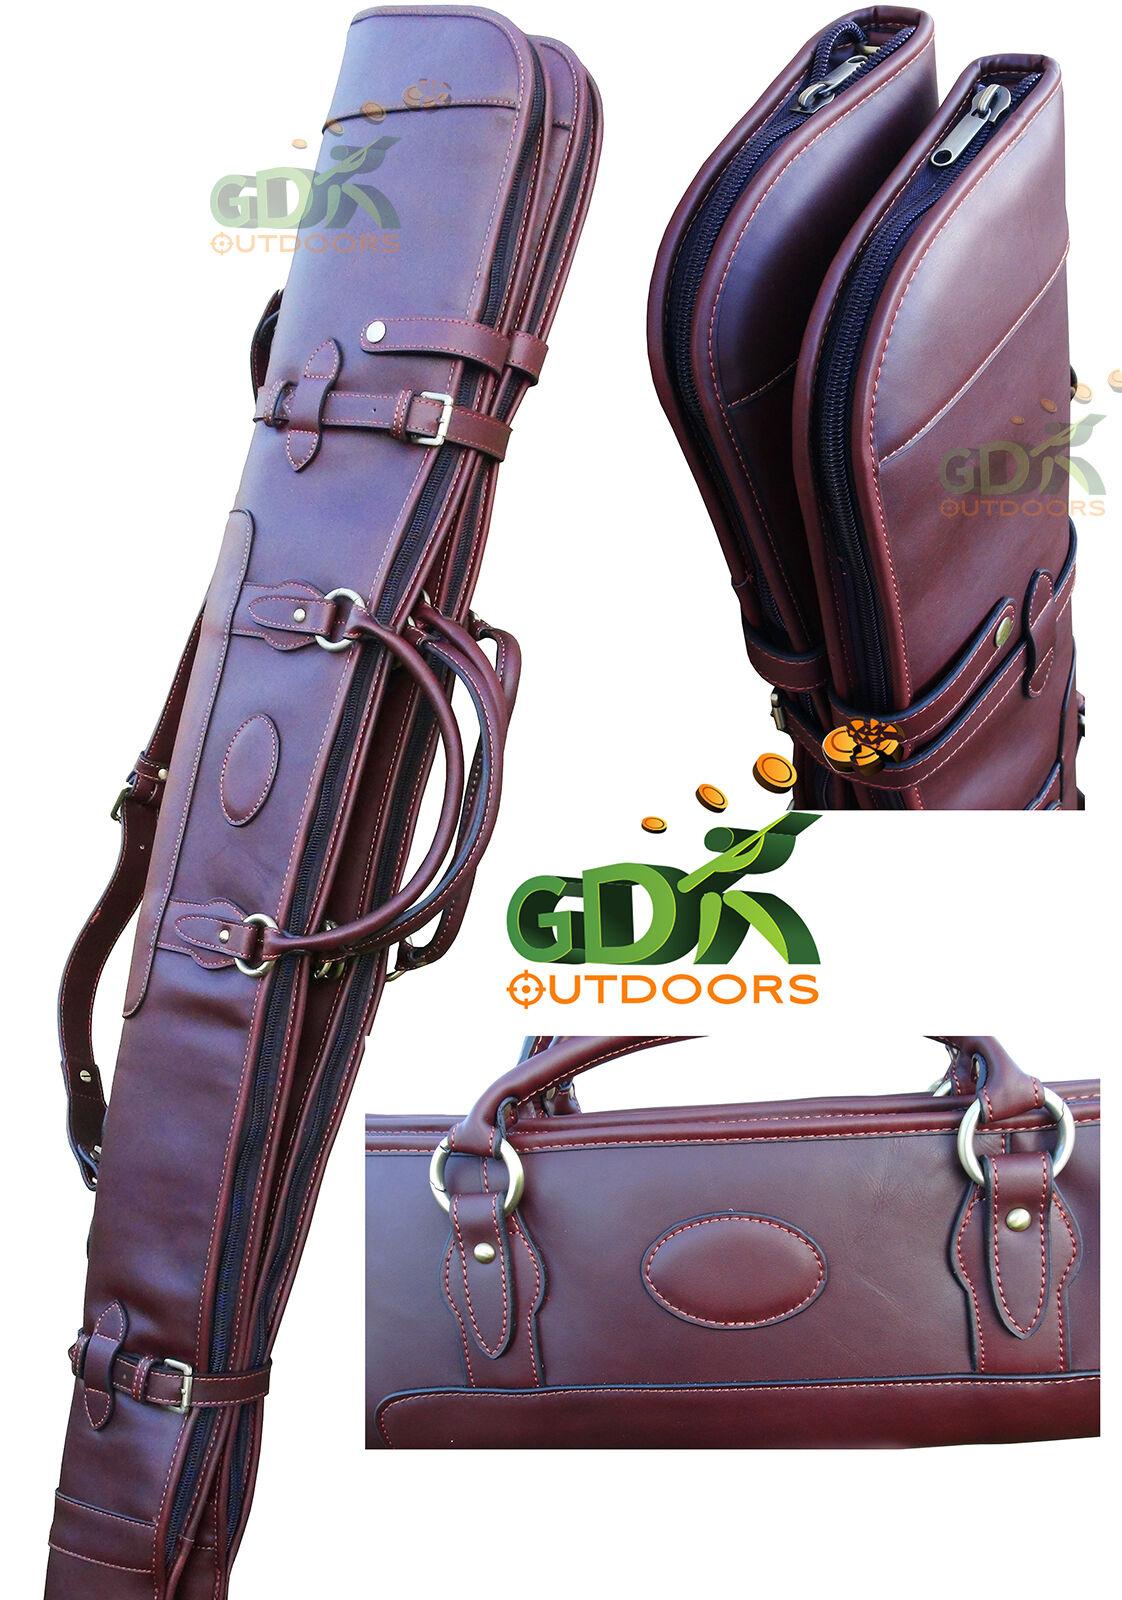 GDK Guardián, de cuero marrón oscuro Doble Escopeta Slip Desmontable, cremallera completa, 268DB